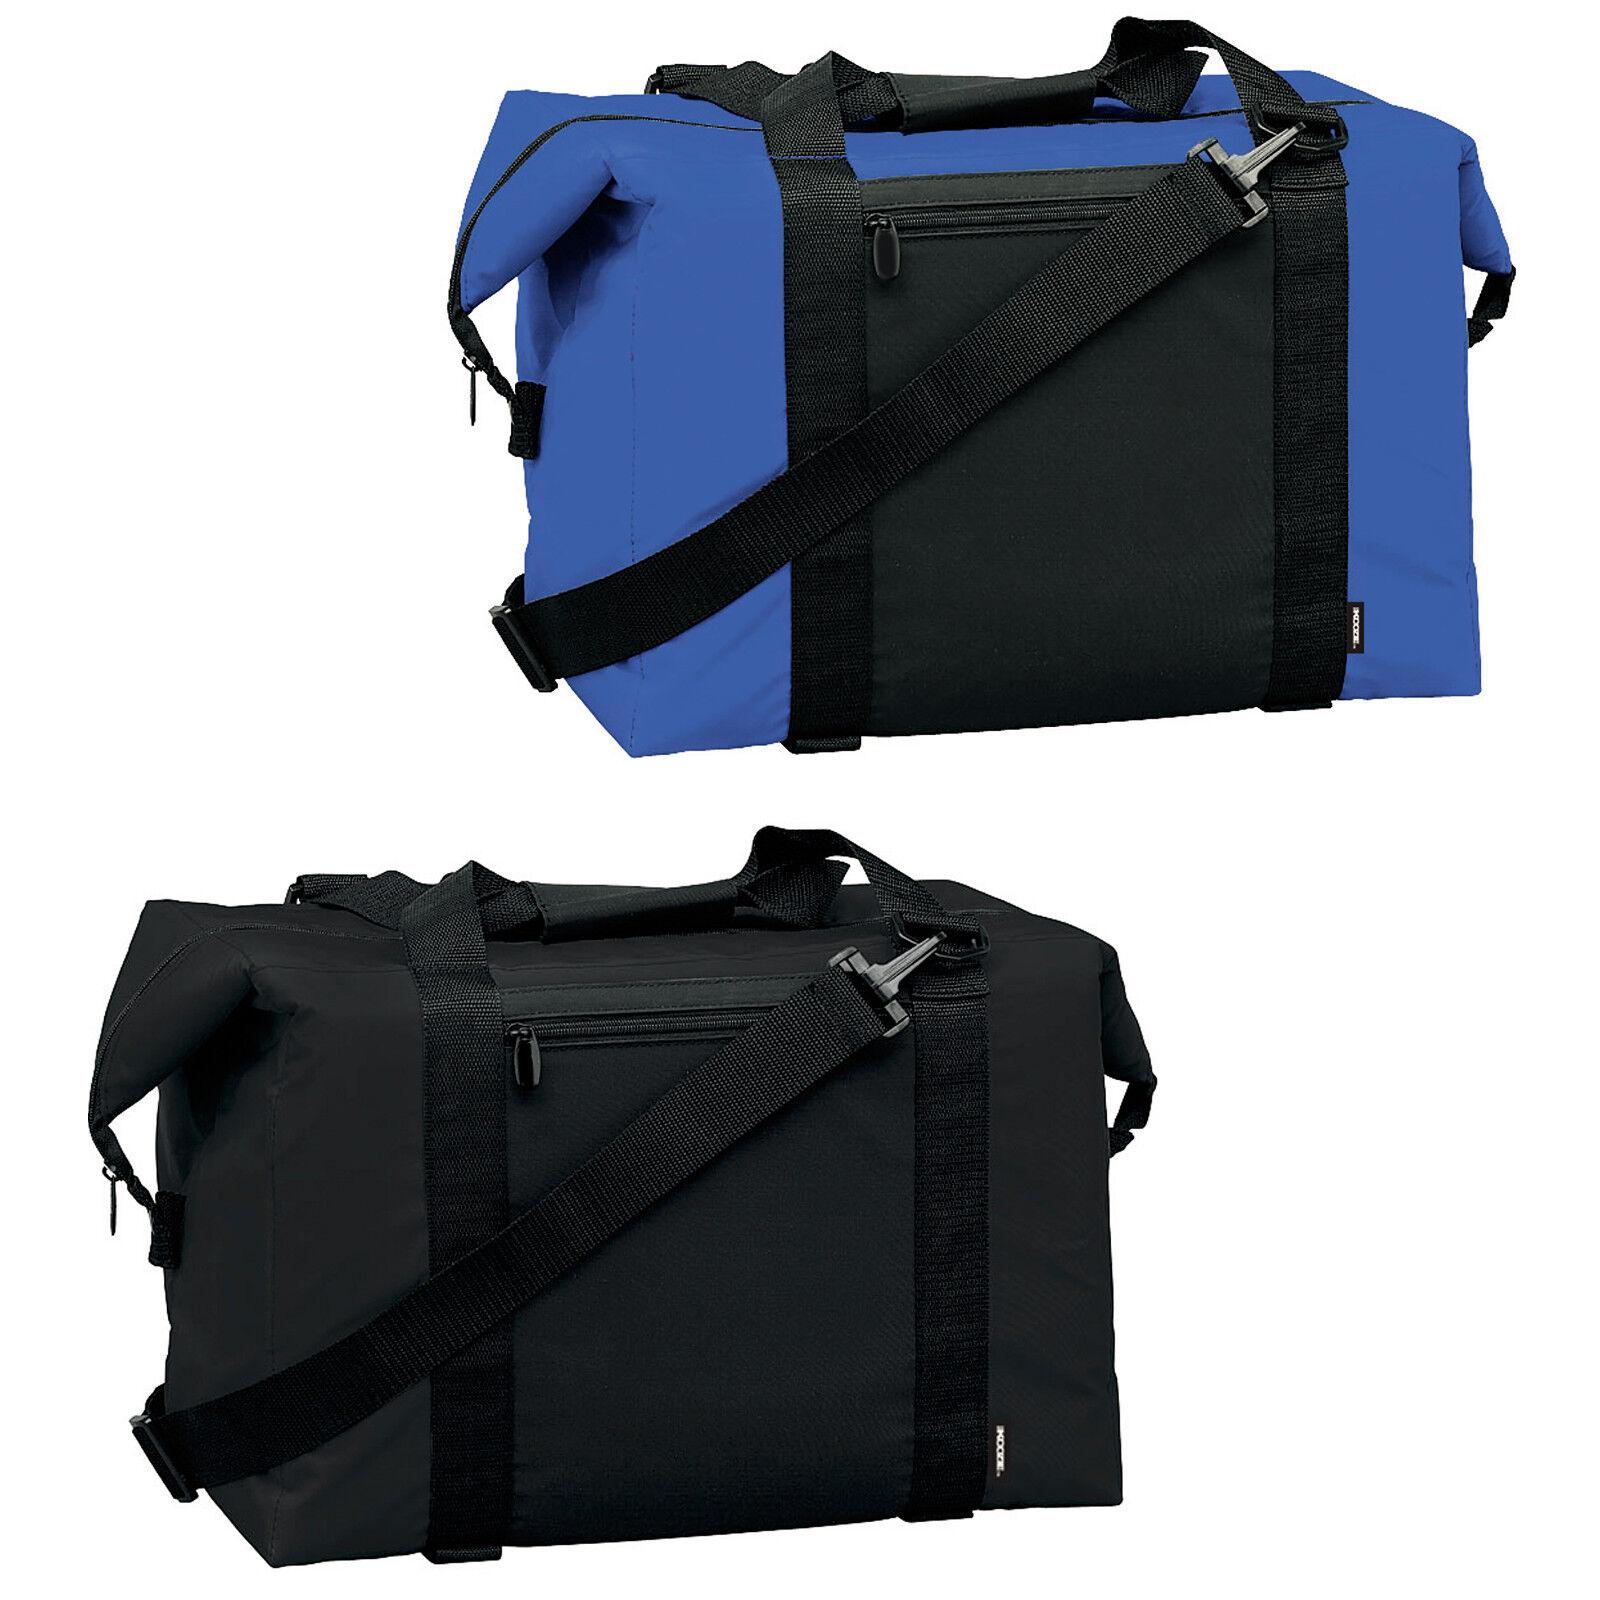 Koozie Grand Sac Réfrigérant Cooler Bag XXL - - - Boîte Déjeuner Canette 3adb74